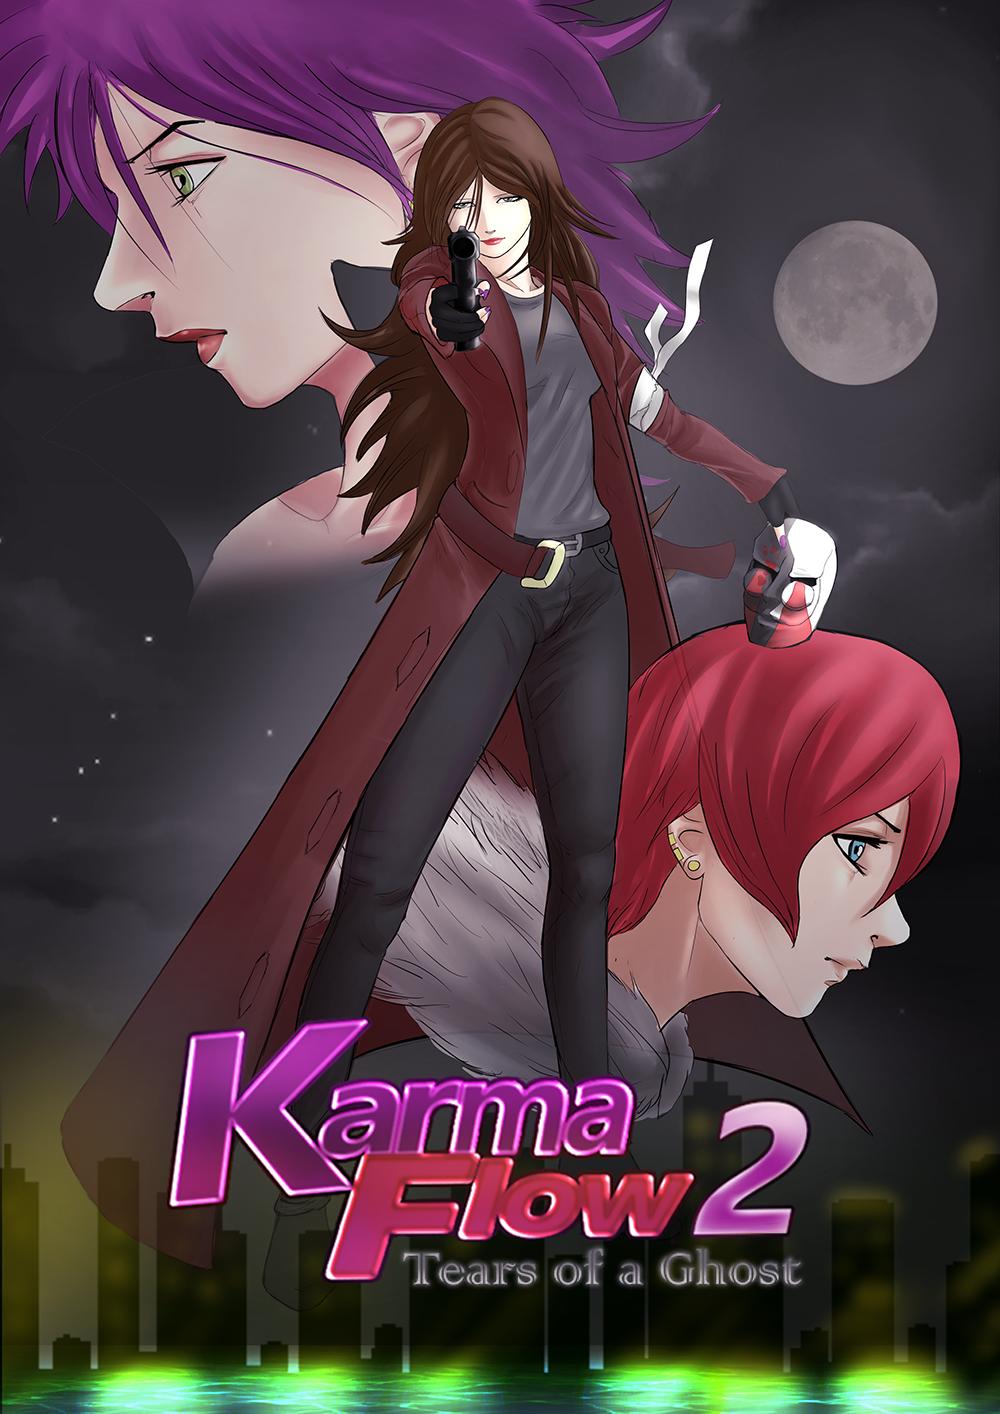 Karma Flow 2 – Tears of a Ghost